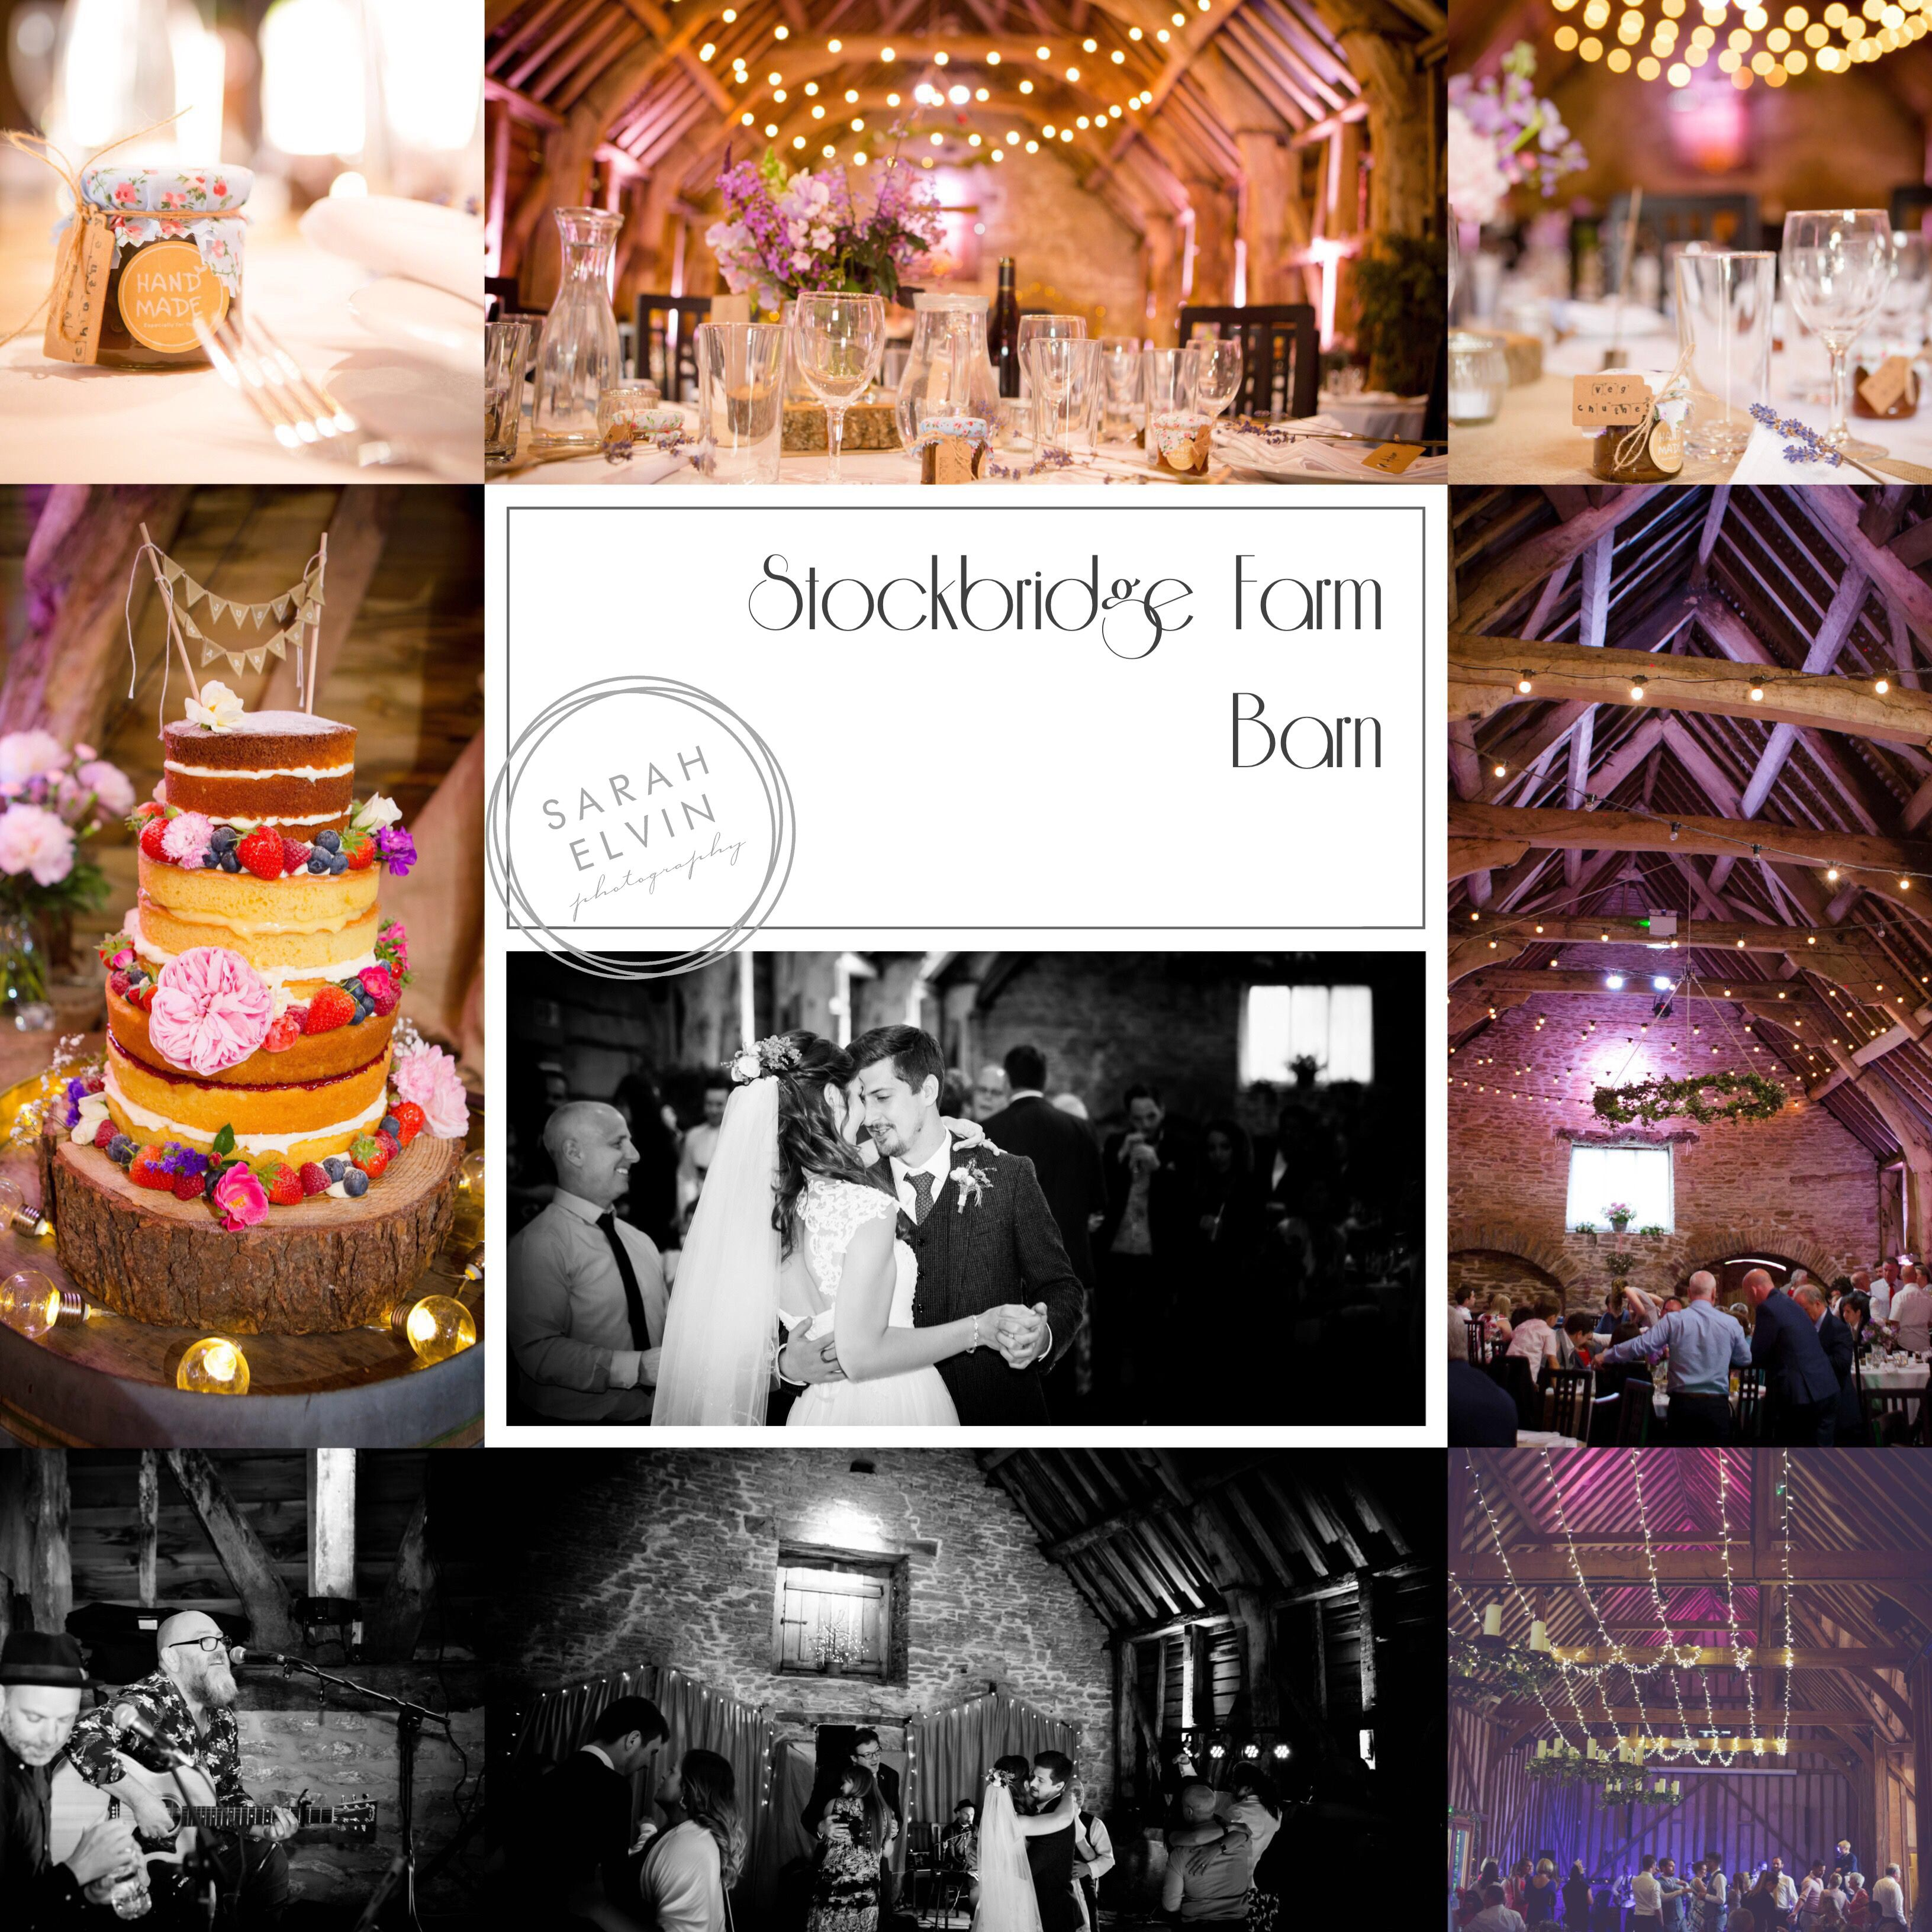 Stockbridge Farm Barn Wedding Somerset, Sarah Elvin